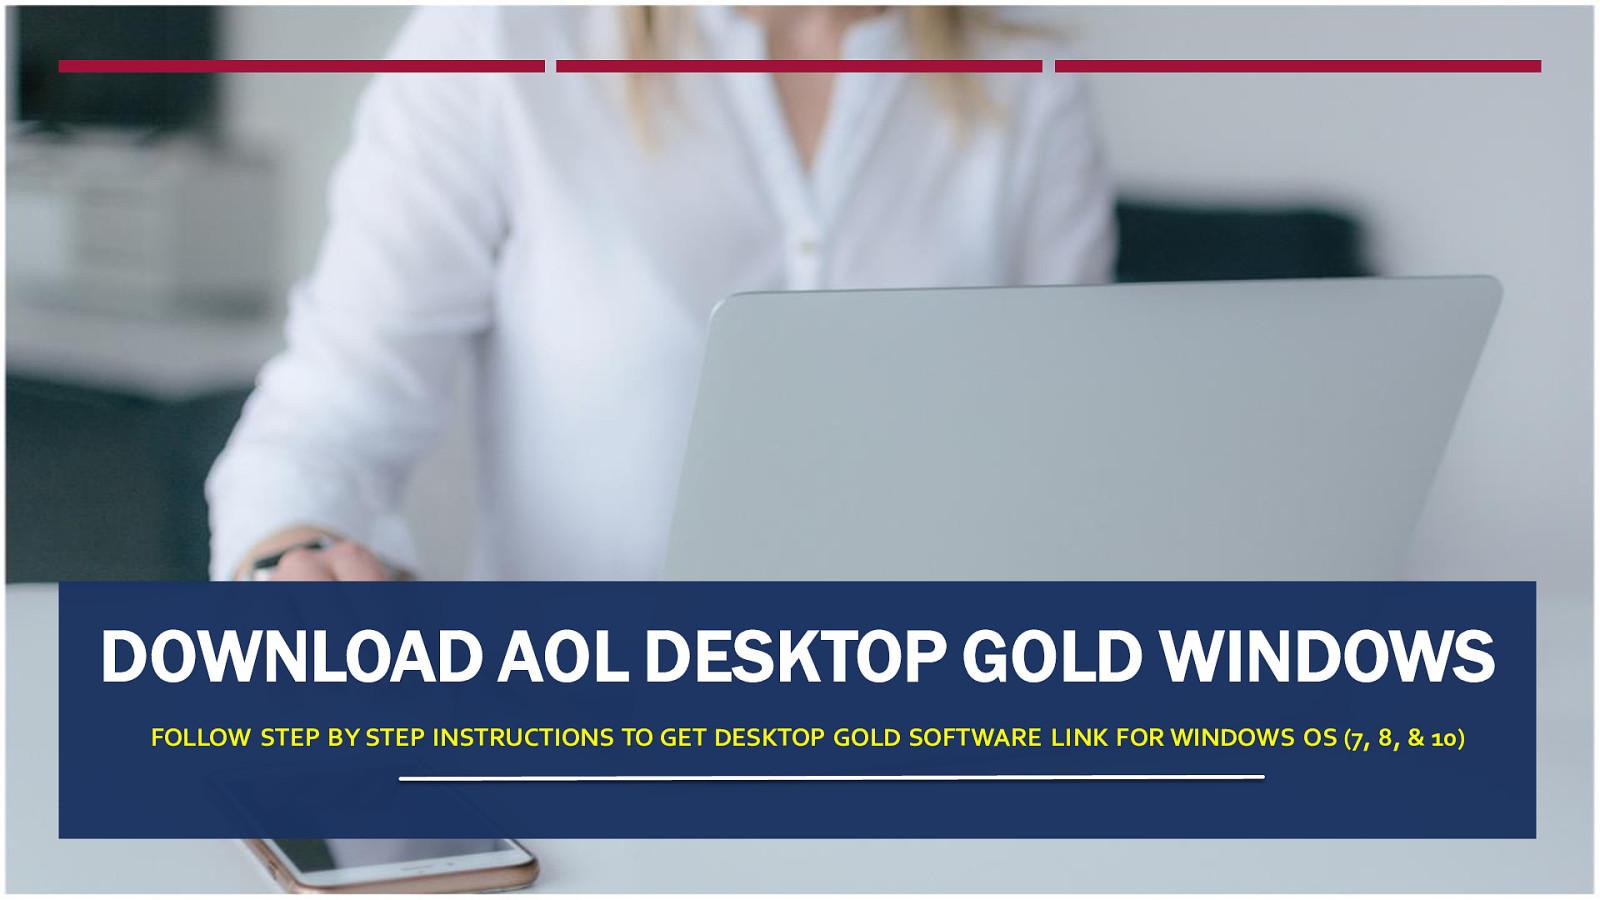 Download AOL Desktop Gold Windows 7 & 10